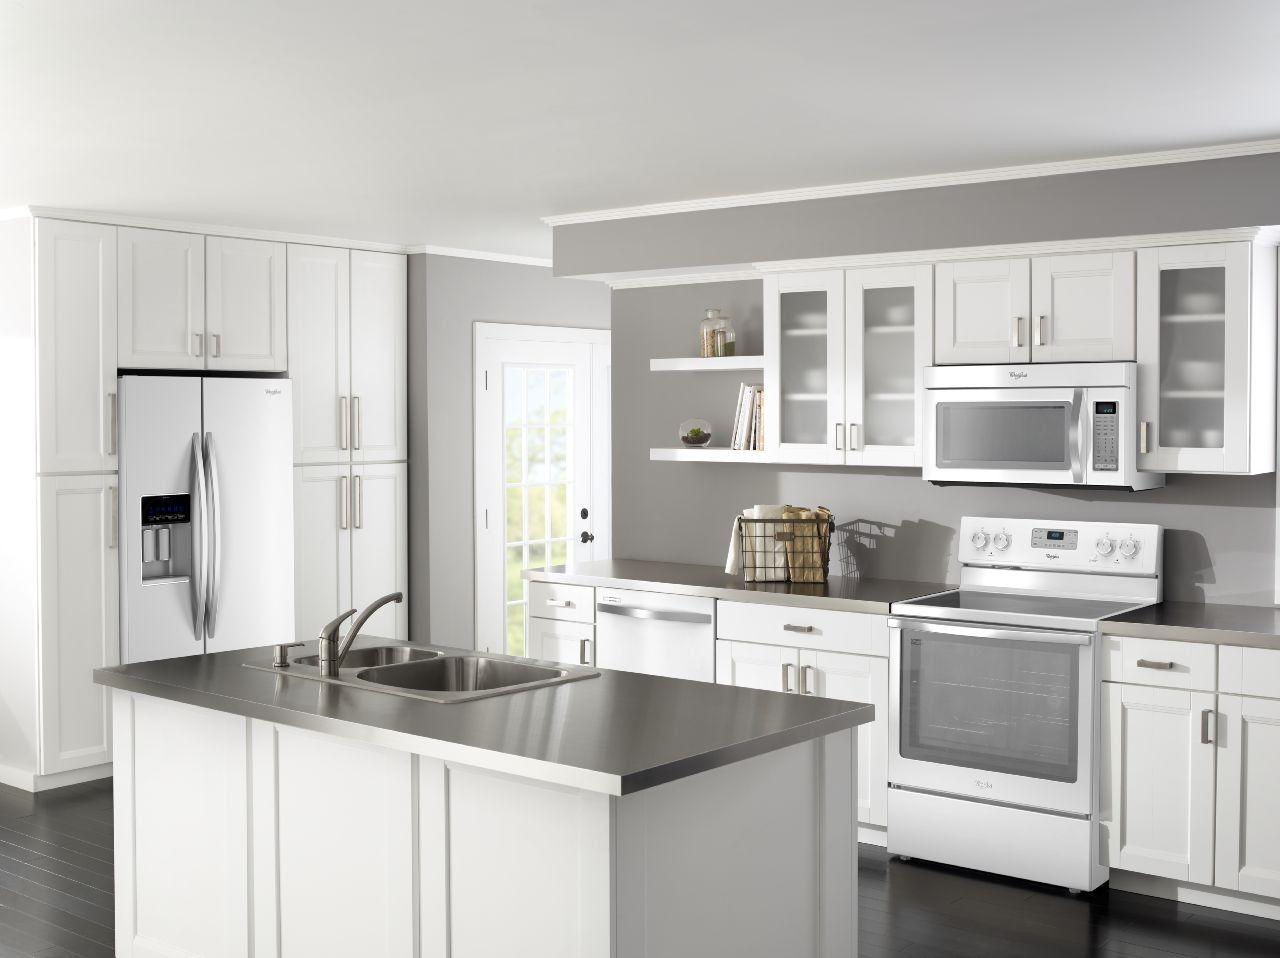 Kitchen Appliances With White Finish